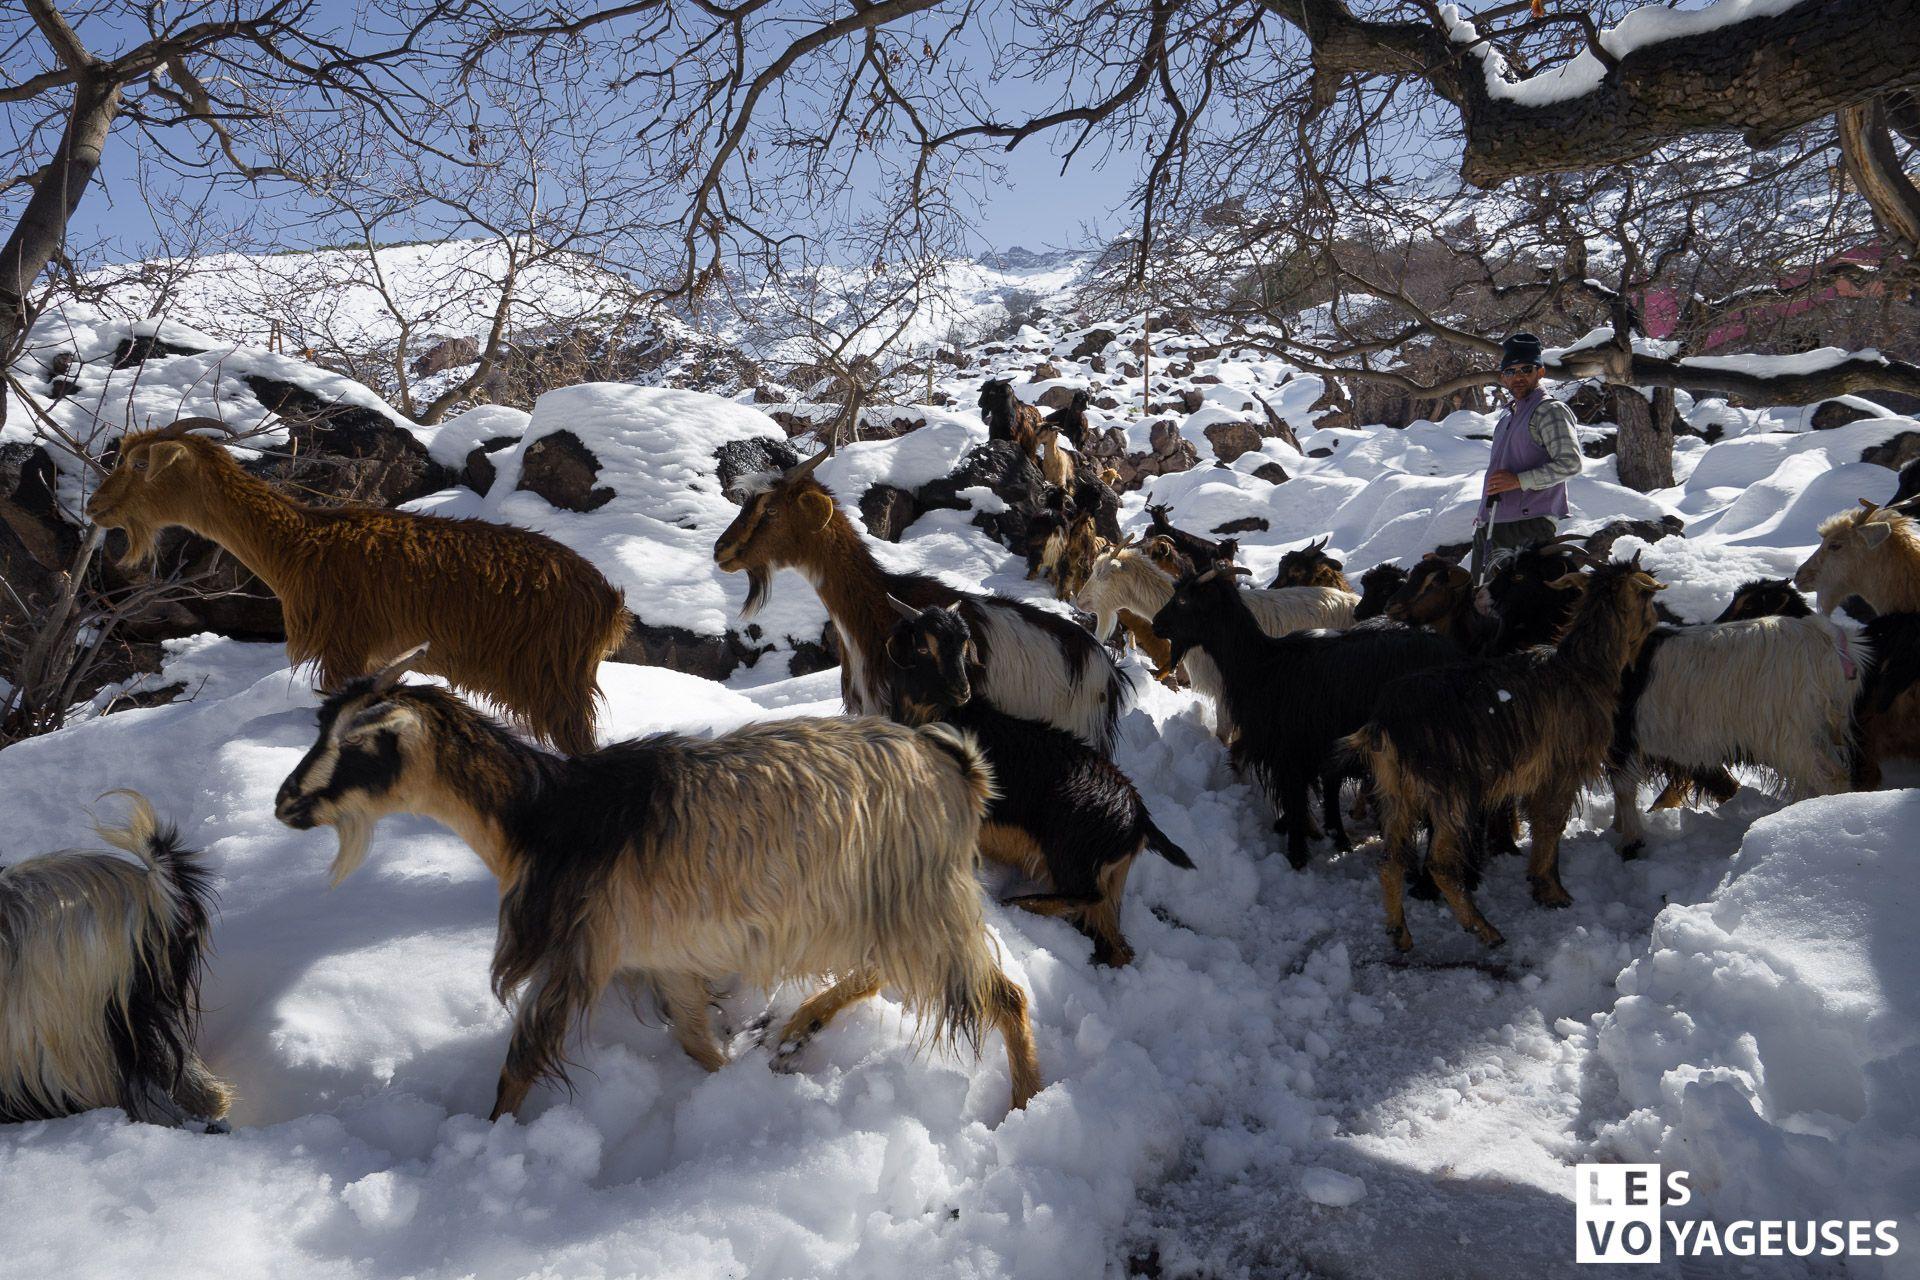 Les-voyageuses-maroc-imlil-hiver-09937